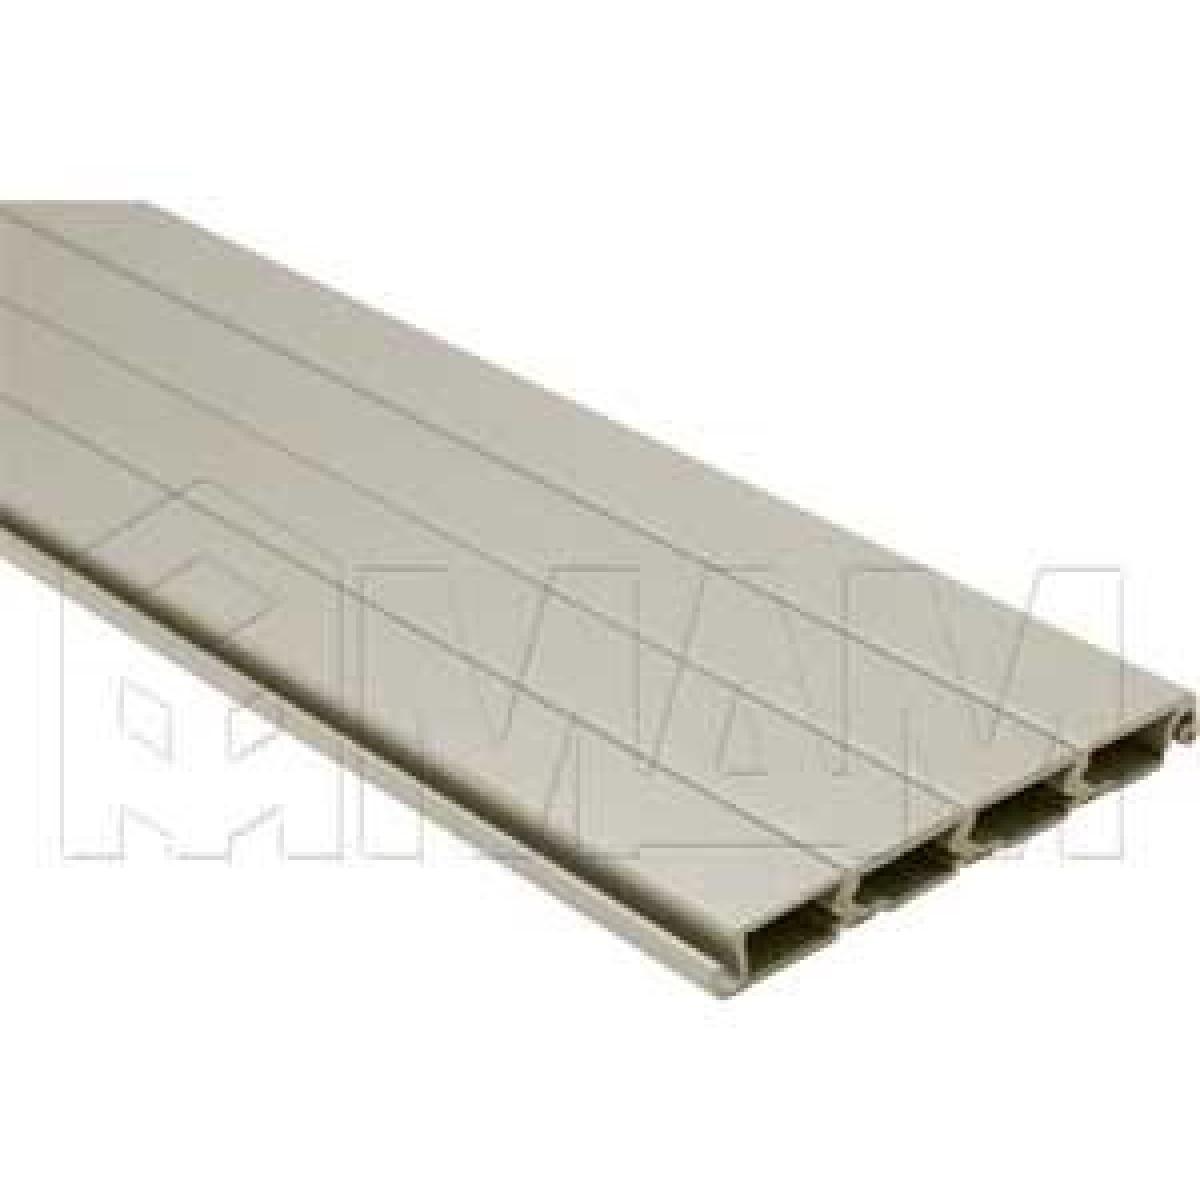 3663 жалюзи, 70 мм (4 ламели), металлик, L-2600